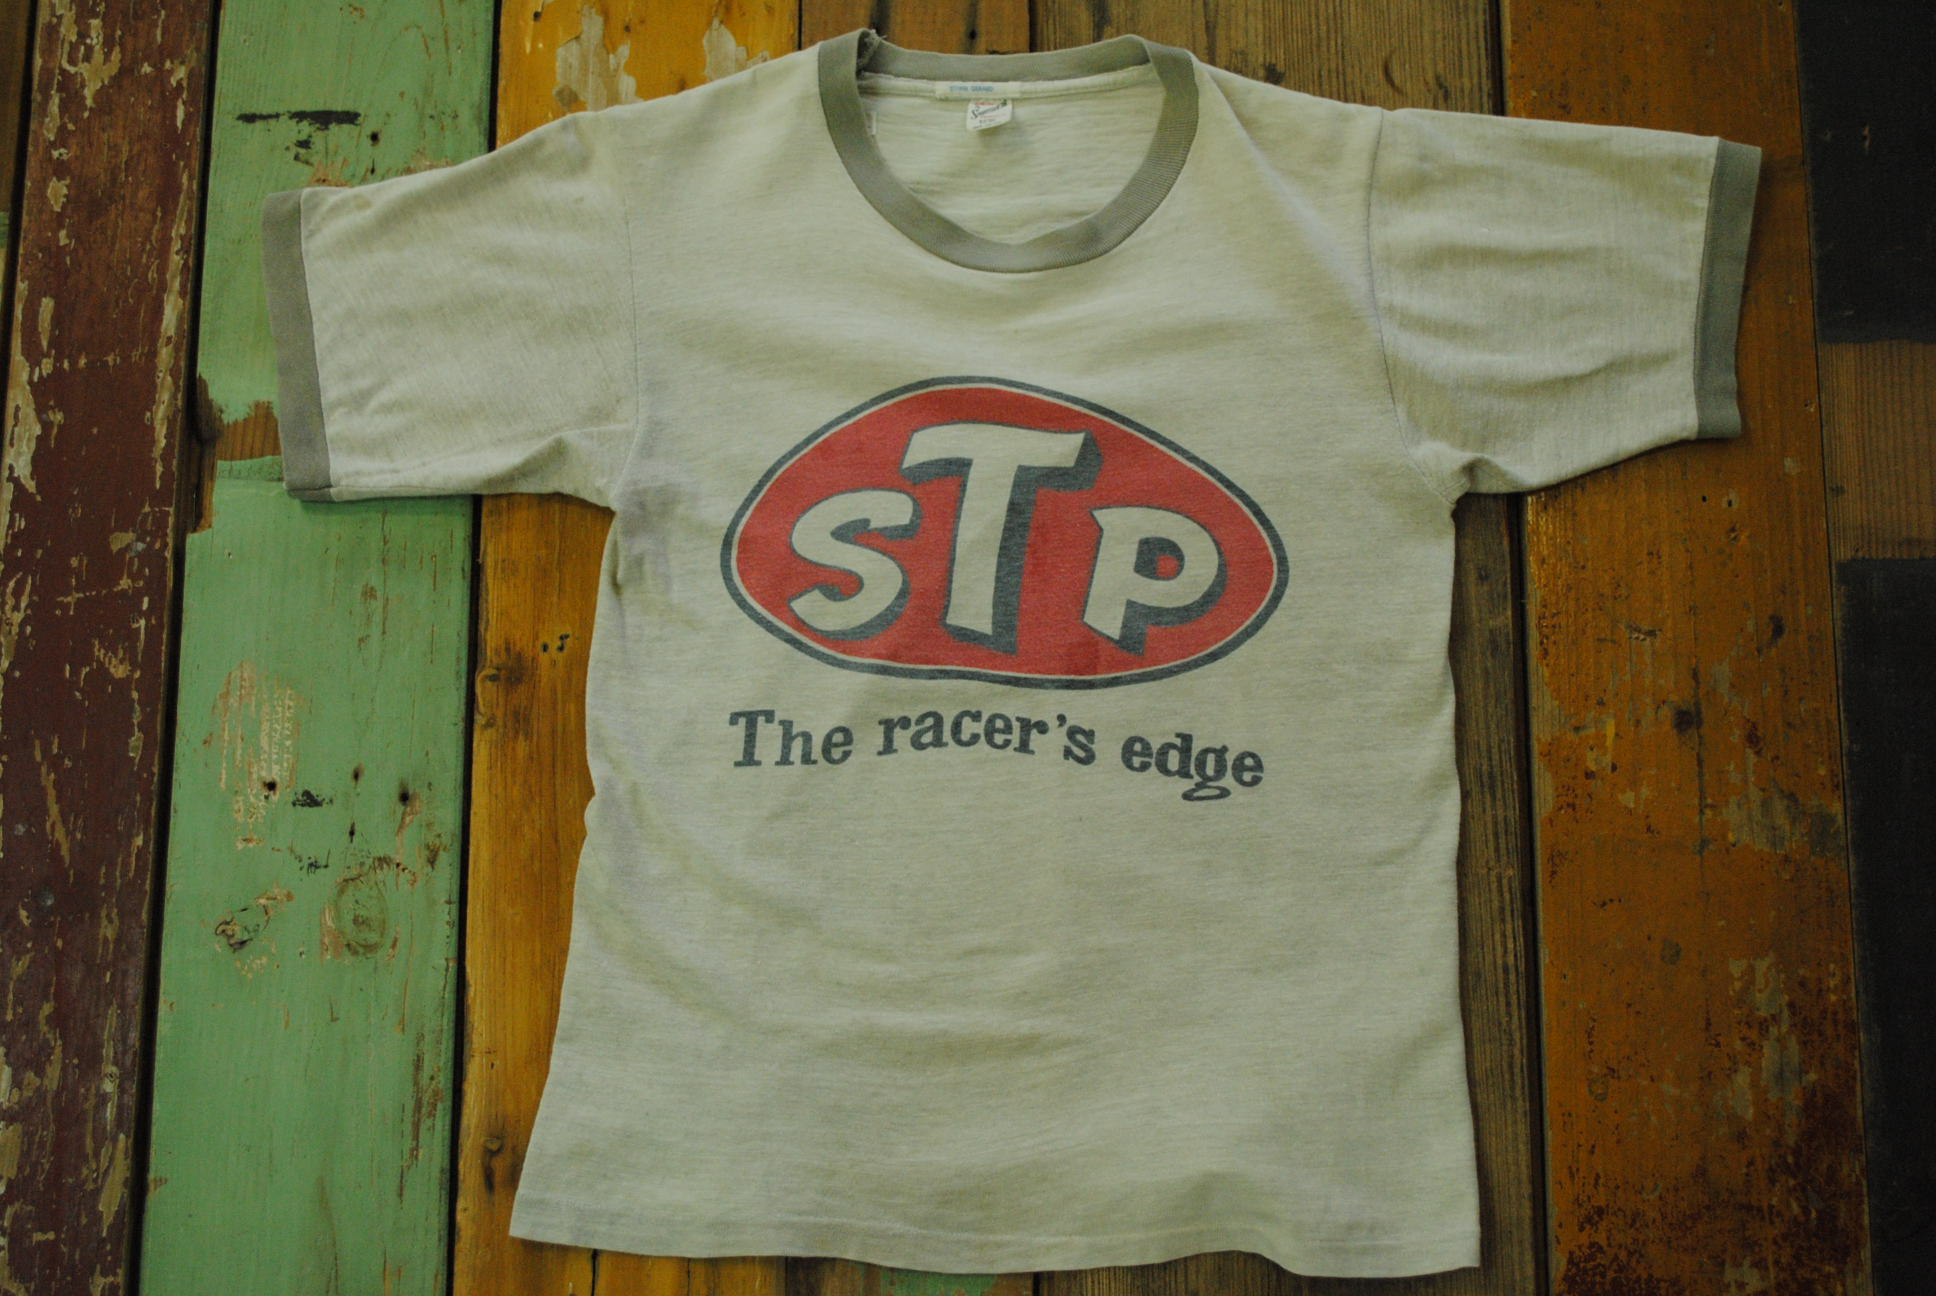 「STP」 OLD T-SHIRTS_f0233425_21544255.jpg